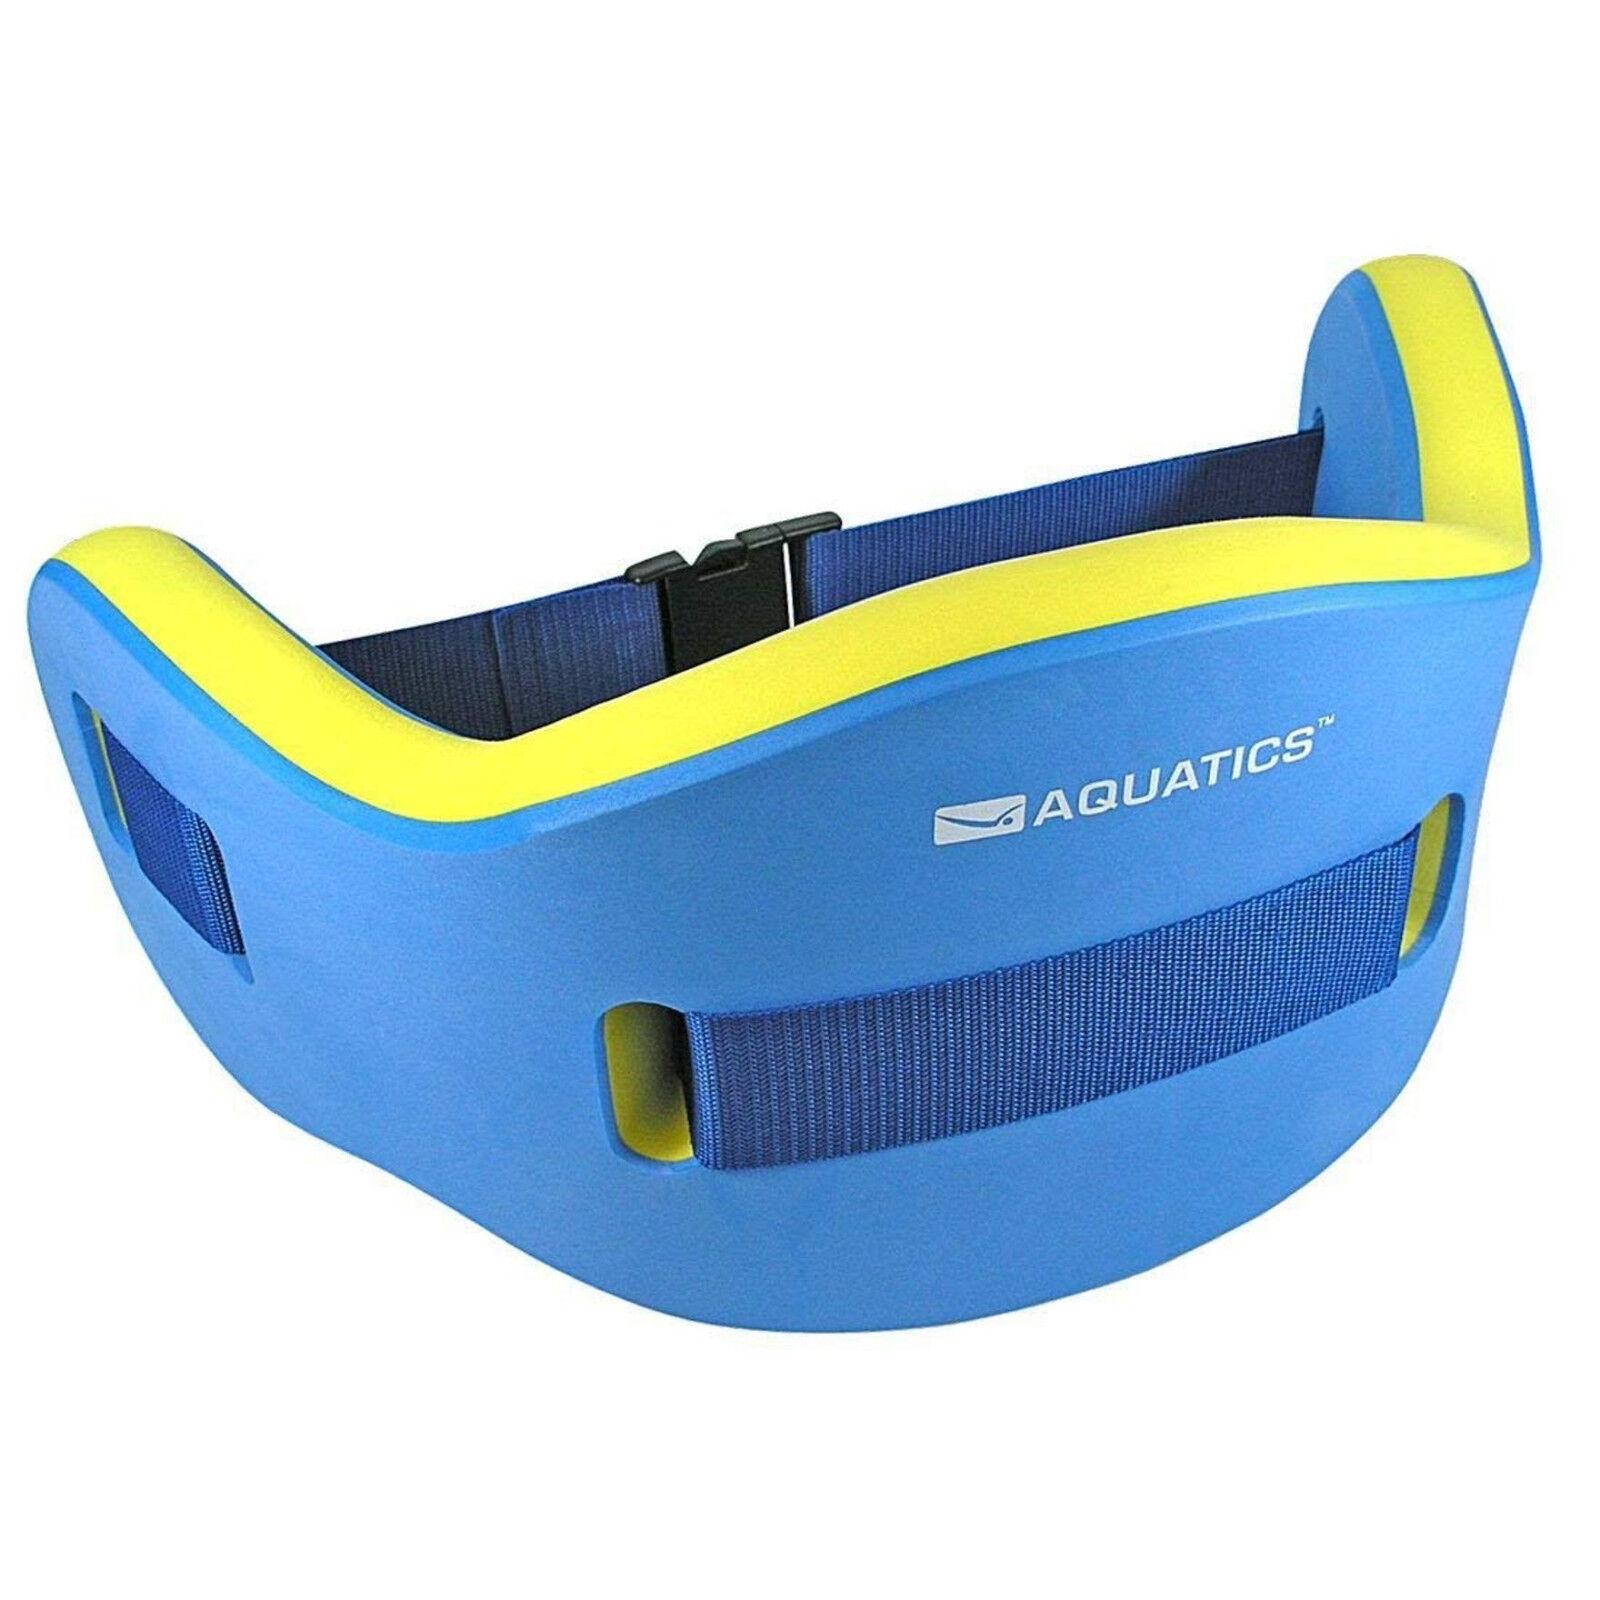 Aquatics Schwimmgürtel Aqua Jogging Schwimmhilfe Wassergymnastik